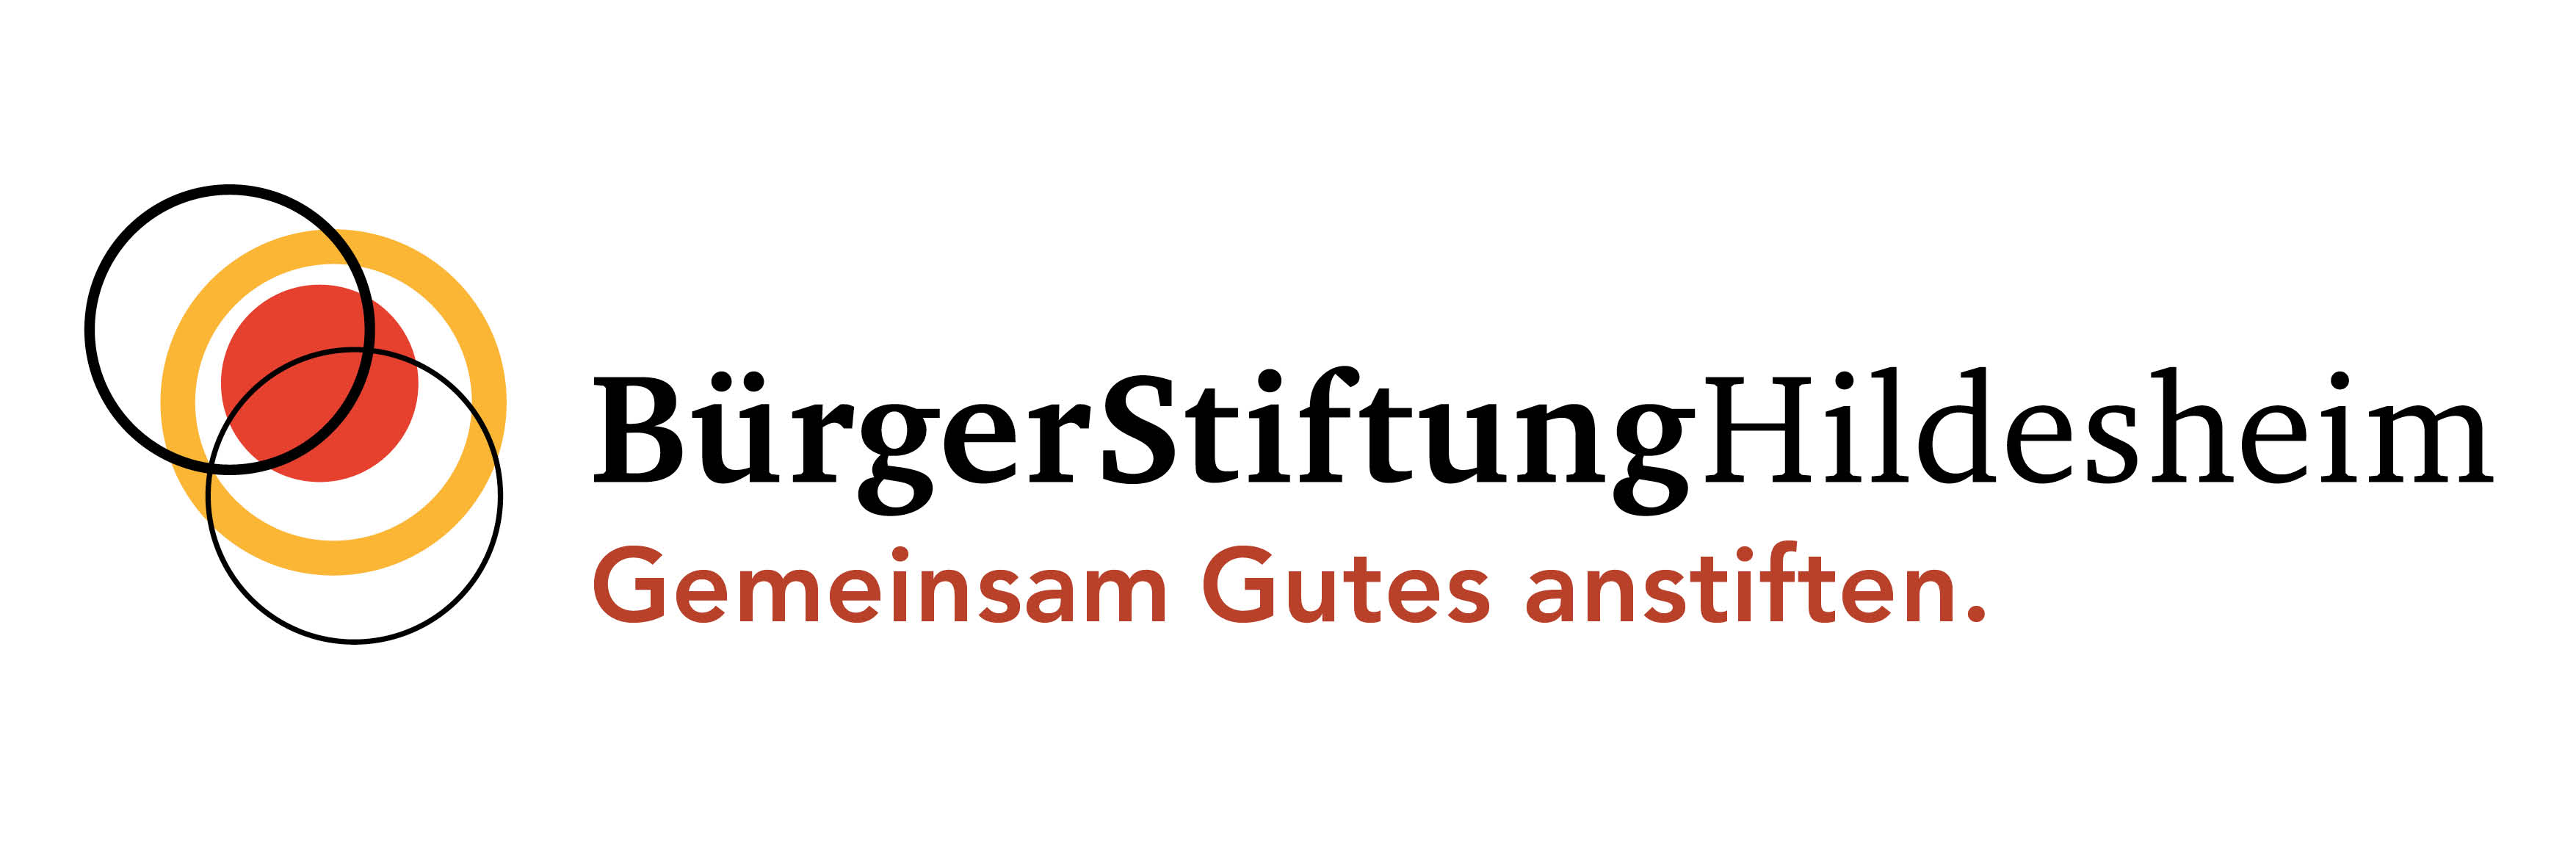 BSHi-Logo-4c-Slogan_einzeilig